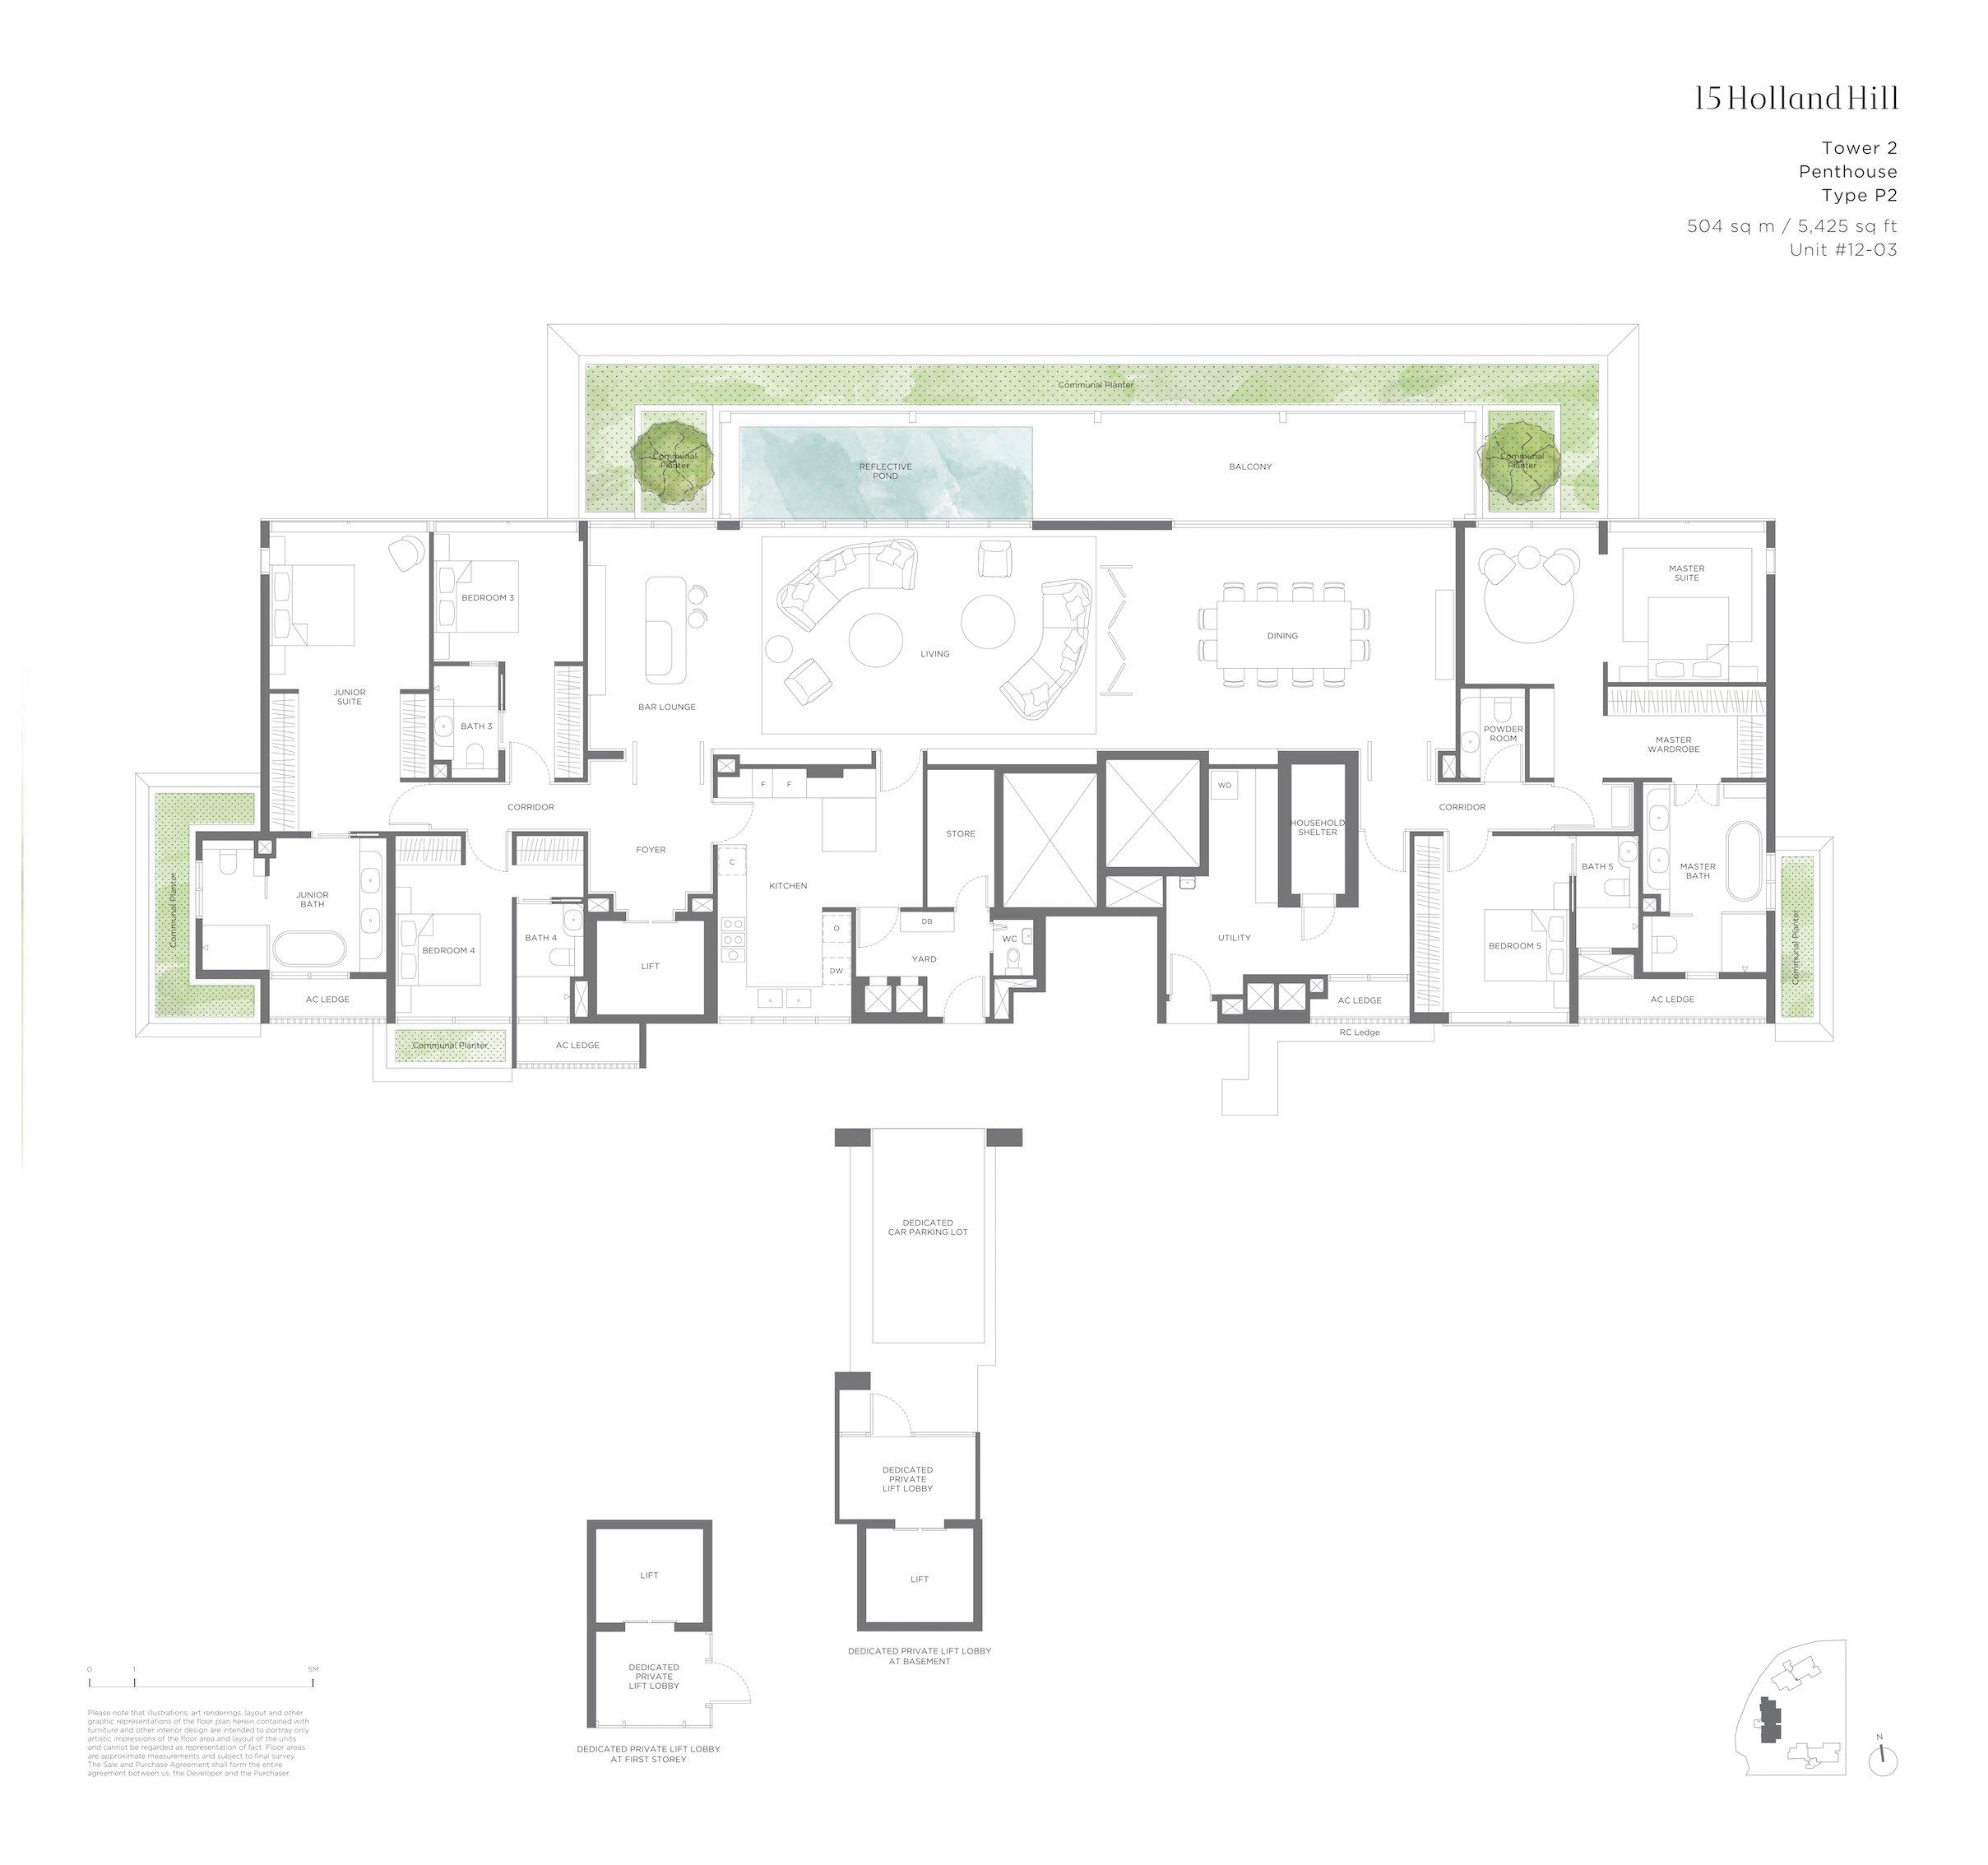 15 Holland Hill 荷兰山公寓 5-bedroom Penthouse p2